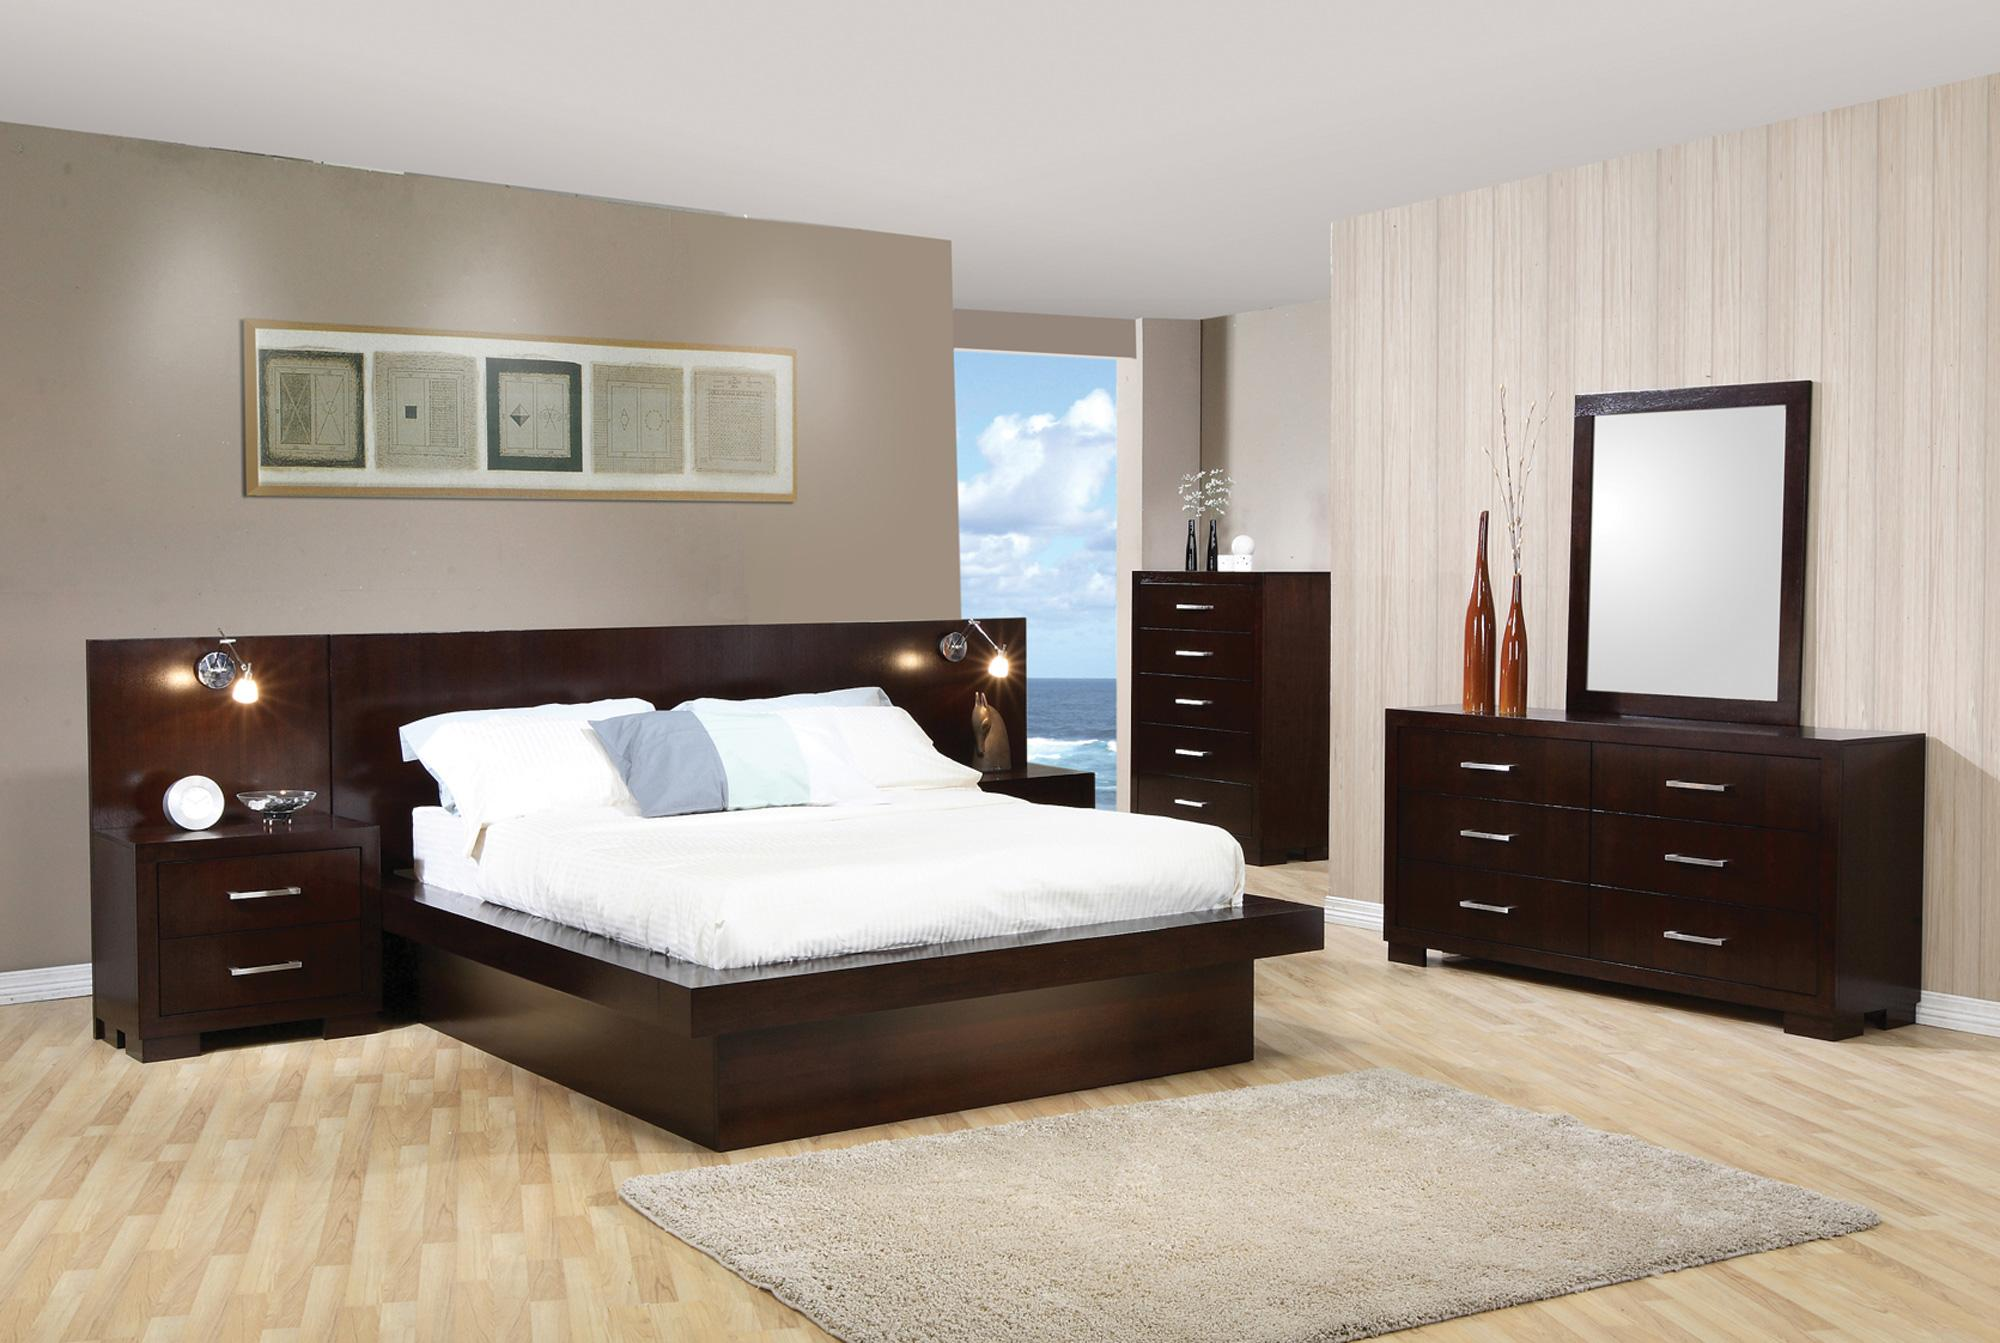 Exceptionnel Coaster Jessica King Bedroom Group   Item Number: 200170 King Bedroom Group  1